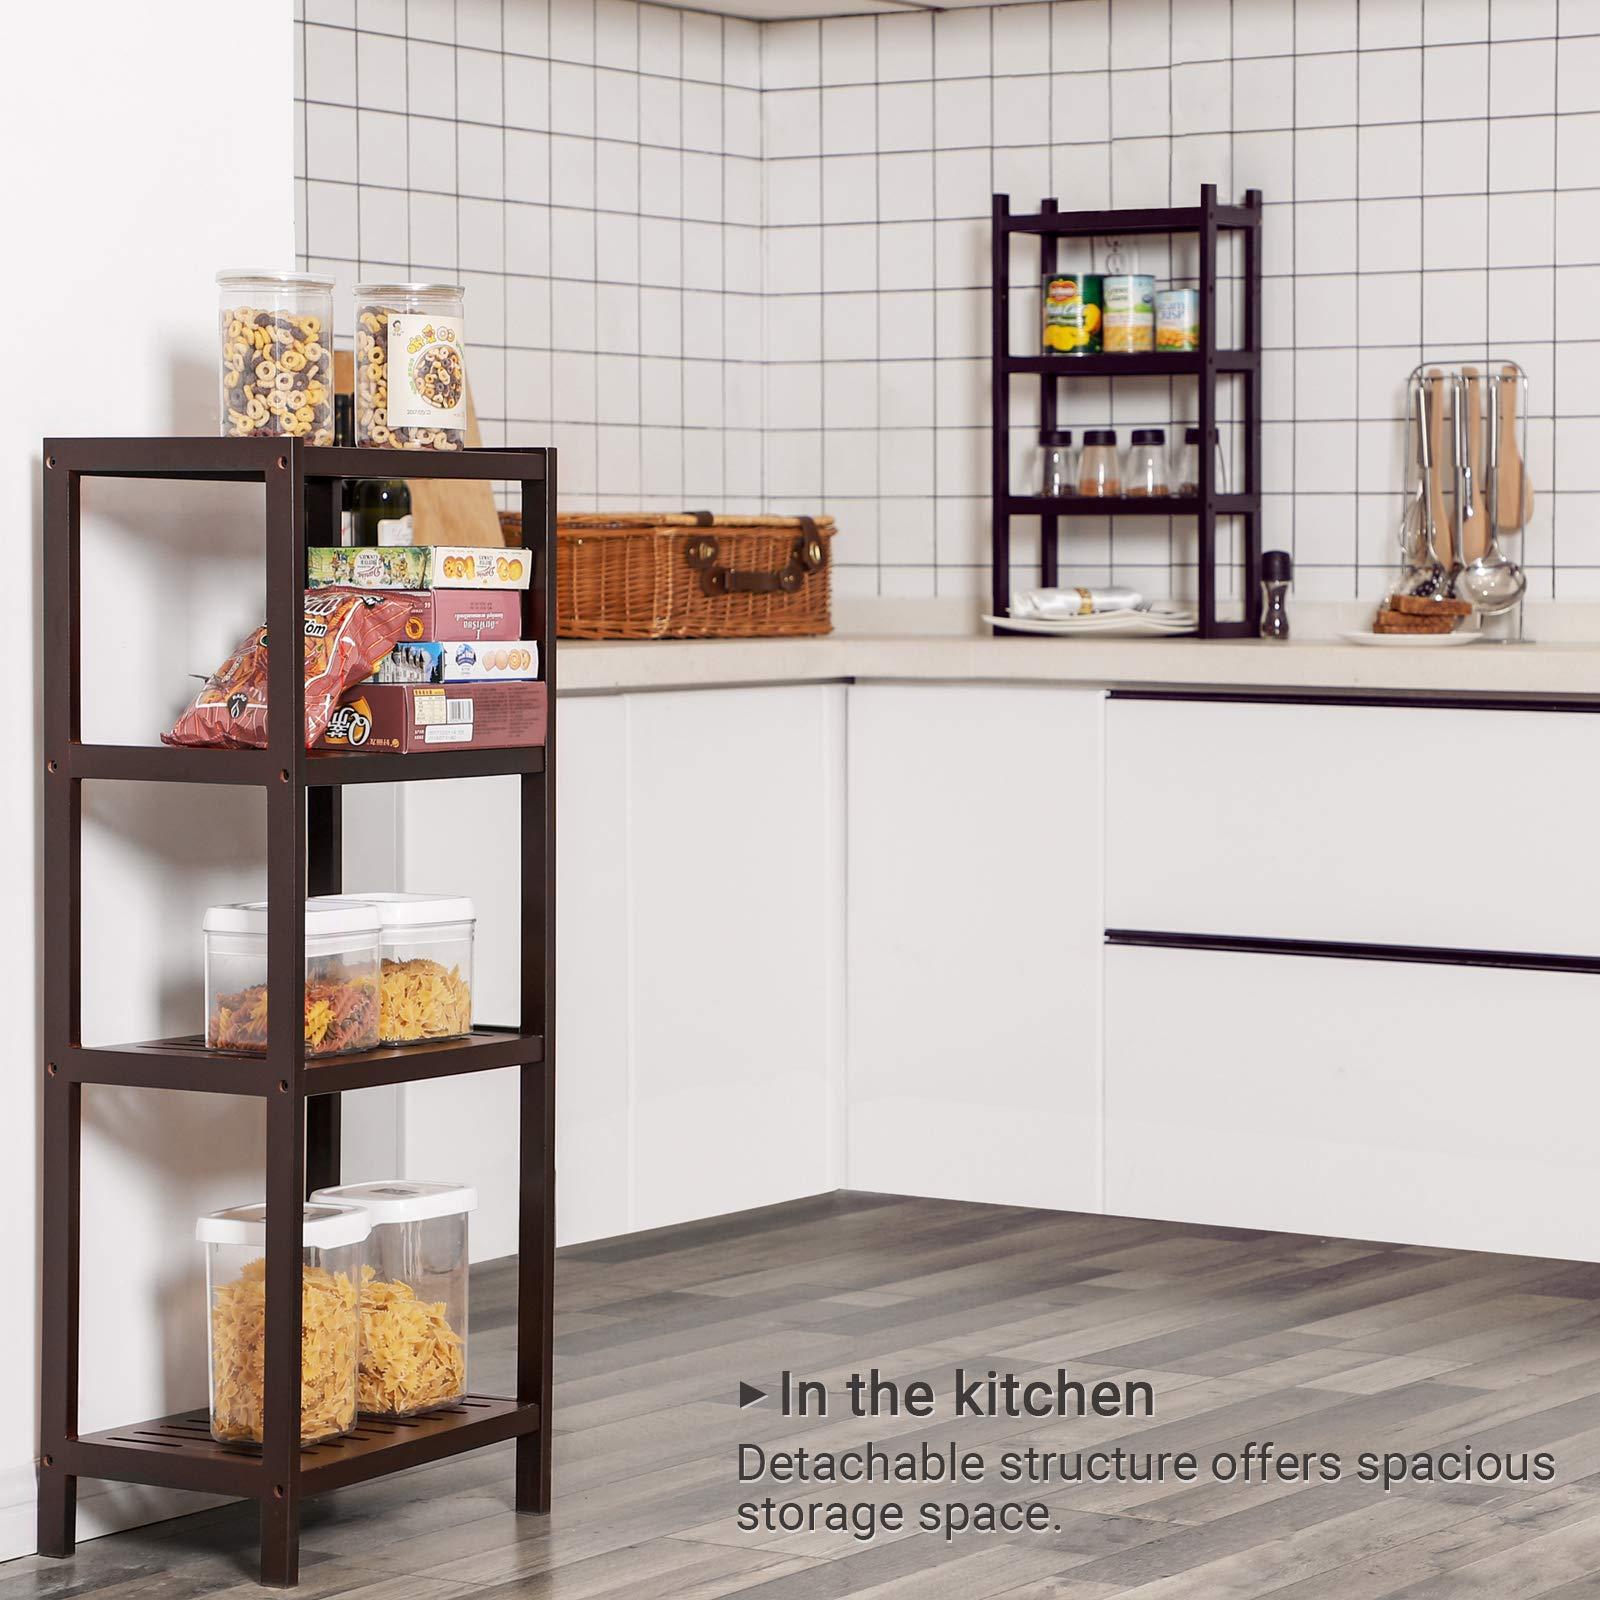 SONGMICS 7-Tier Bamboo Bathroom Shelf, 2-in-1 Design Adjustable Storage Rack, Free Standing Multifunctional Organizer, Shelving Unit for Washroom, Living Room, Kitchen, Brown UBCR01BR by SONGMICS (Image #5)